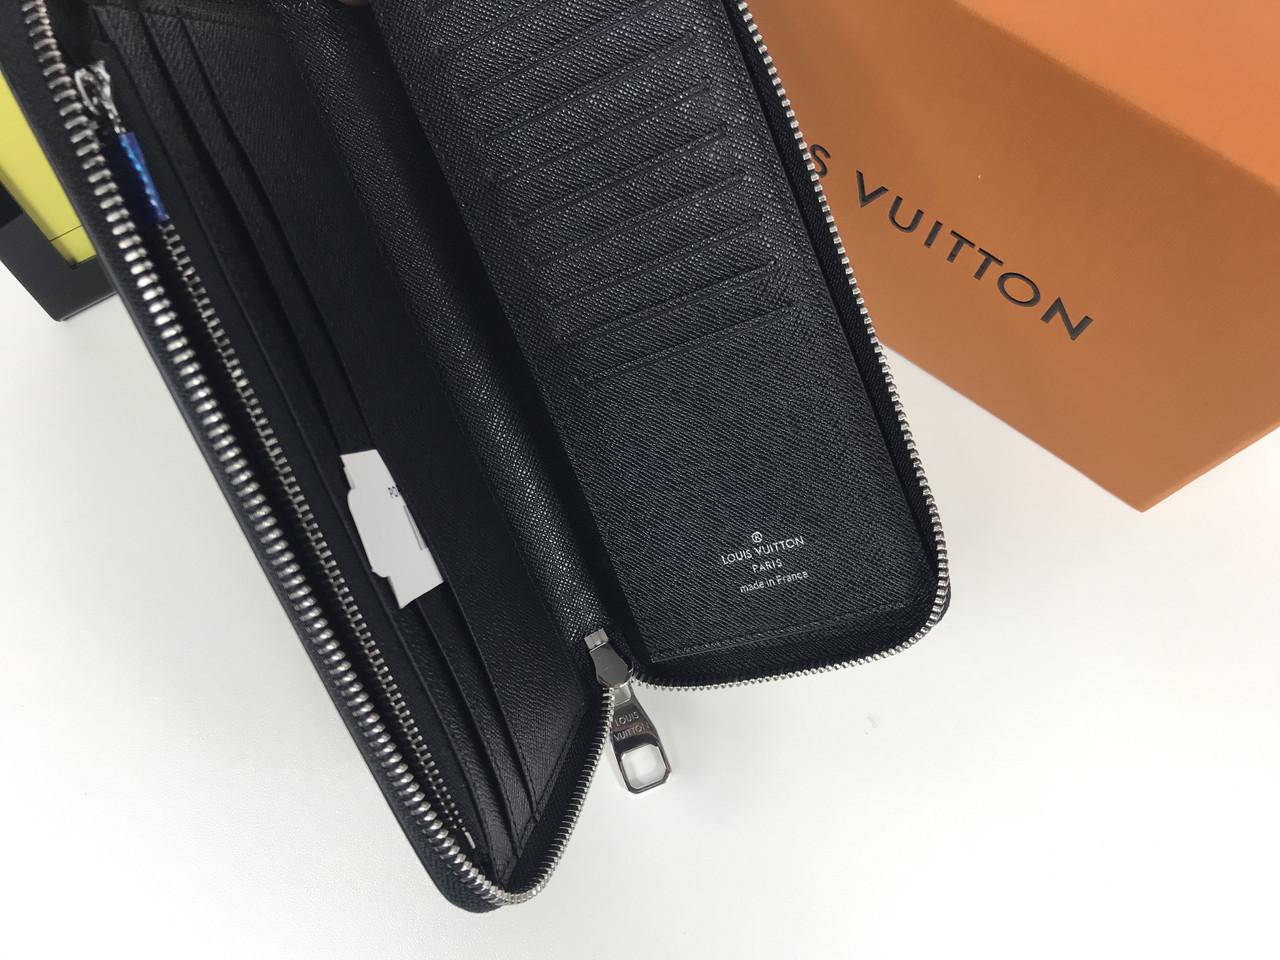 3624bcc57475 Портмоне Louis Vuitton - купить портмоне мужское Alexandre   vkstore ...